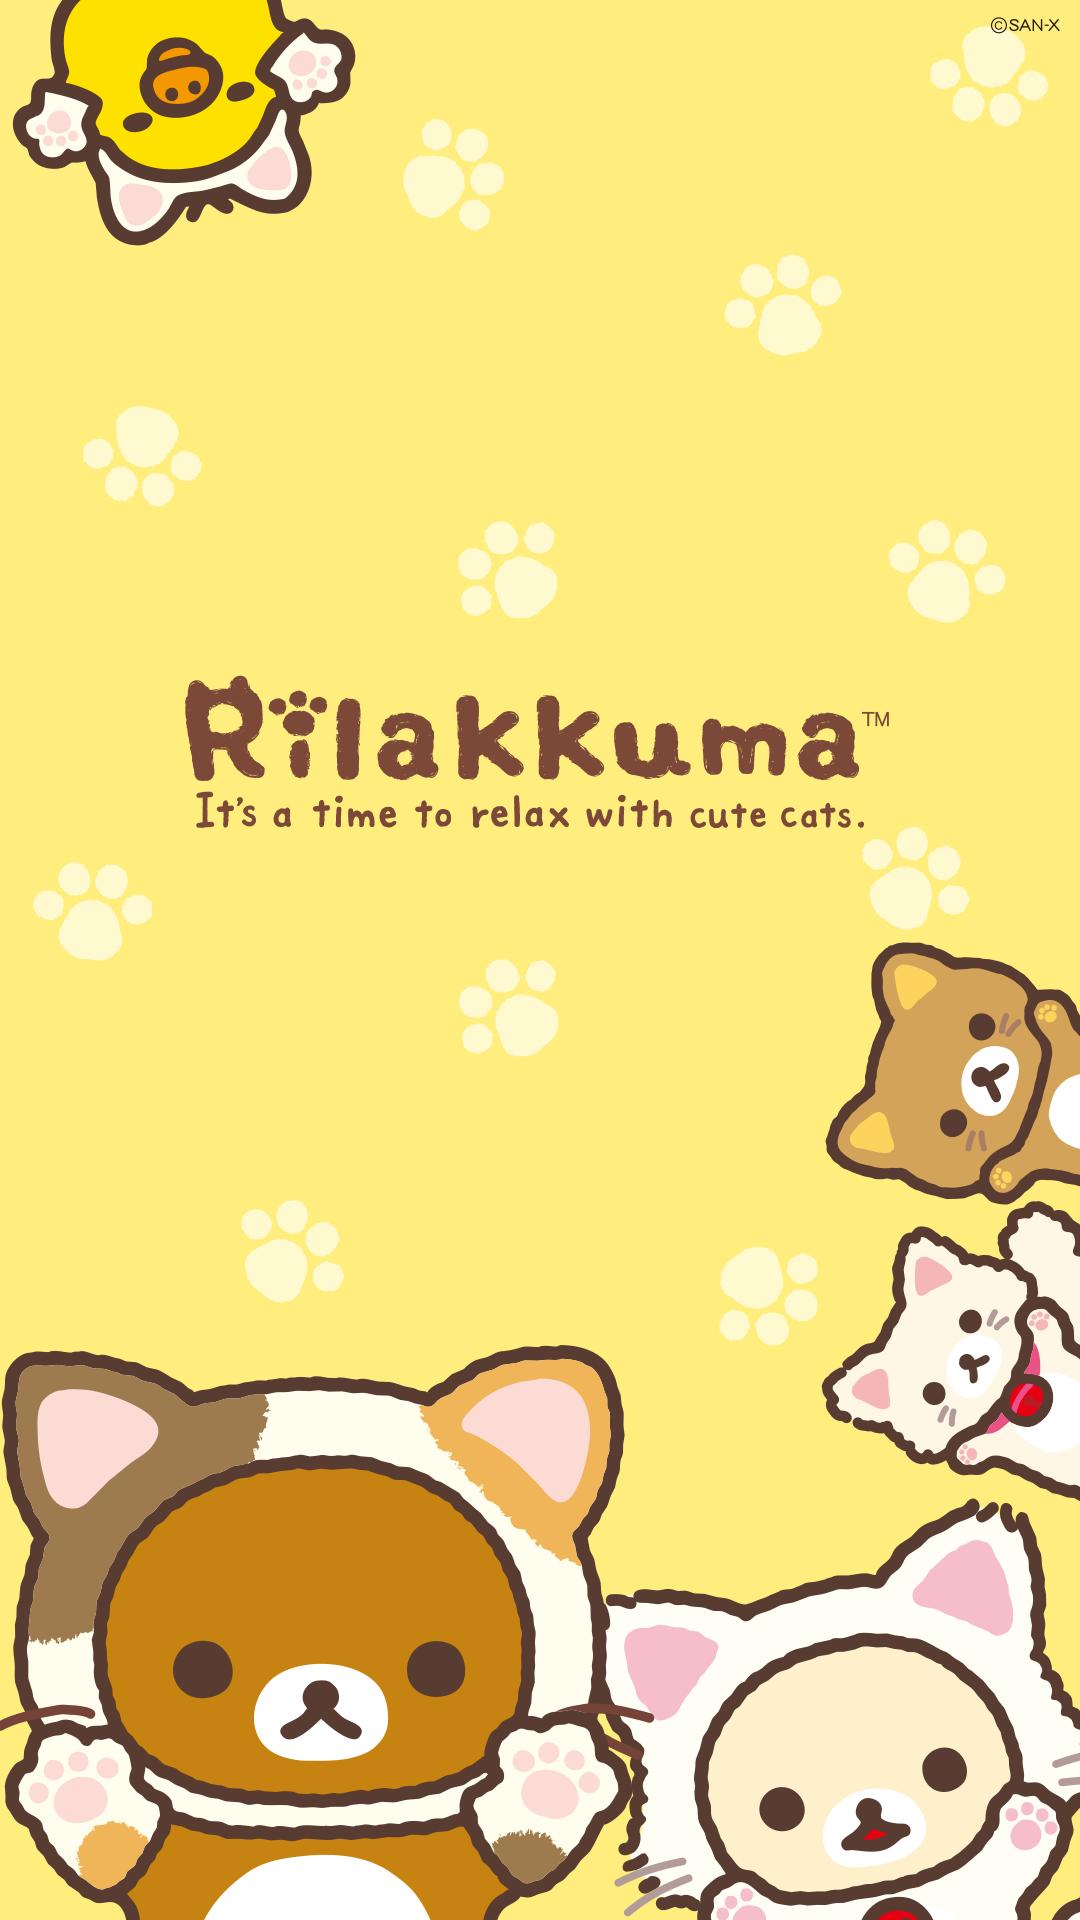 Iheartrilakkuma rilakkuma cat series phone wallpaper - Kawaii phone backgrounds ...